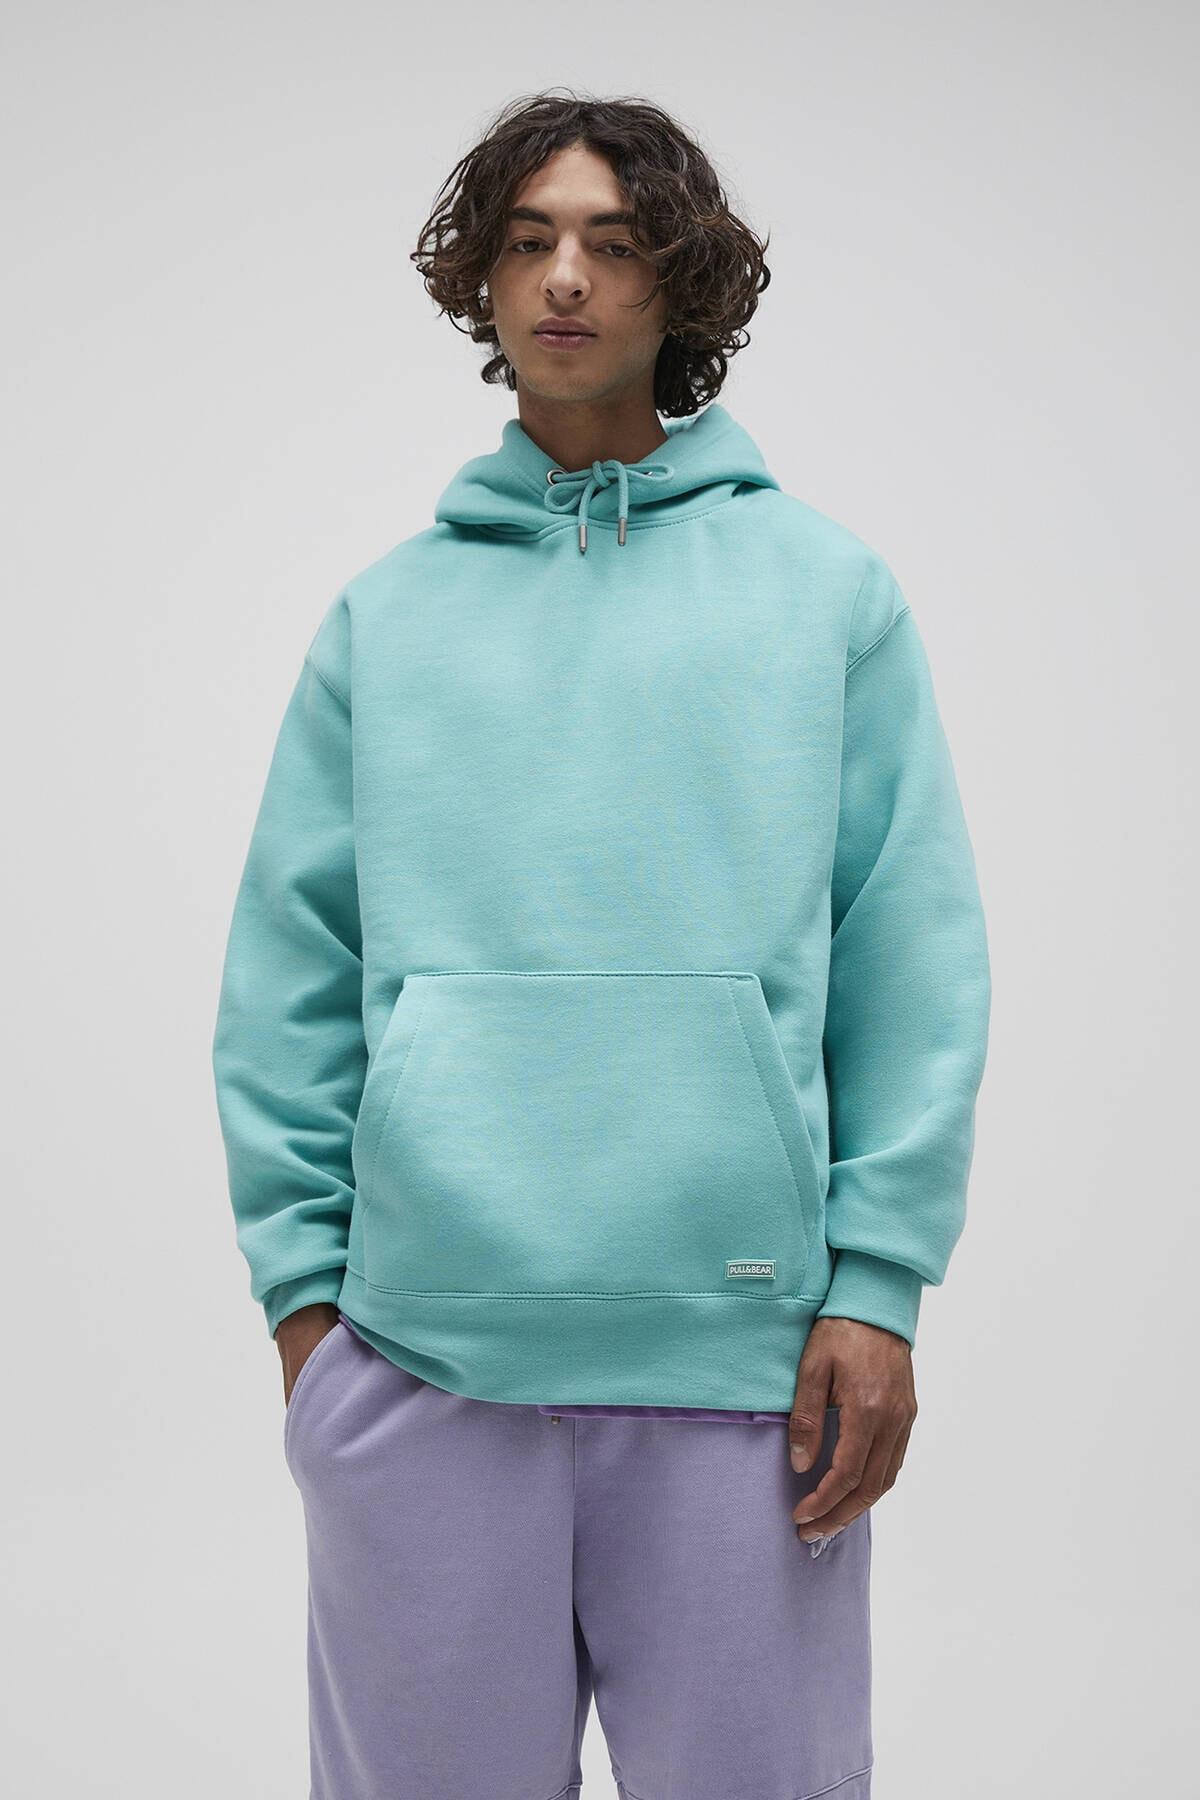 Pull & Bear Erkek Açık Yeşil Basic Comfort Fit Kapüşonlu Sweatshirt 09594913 0